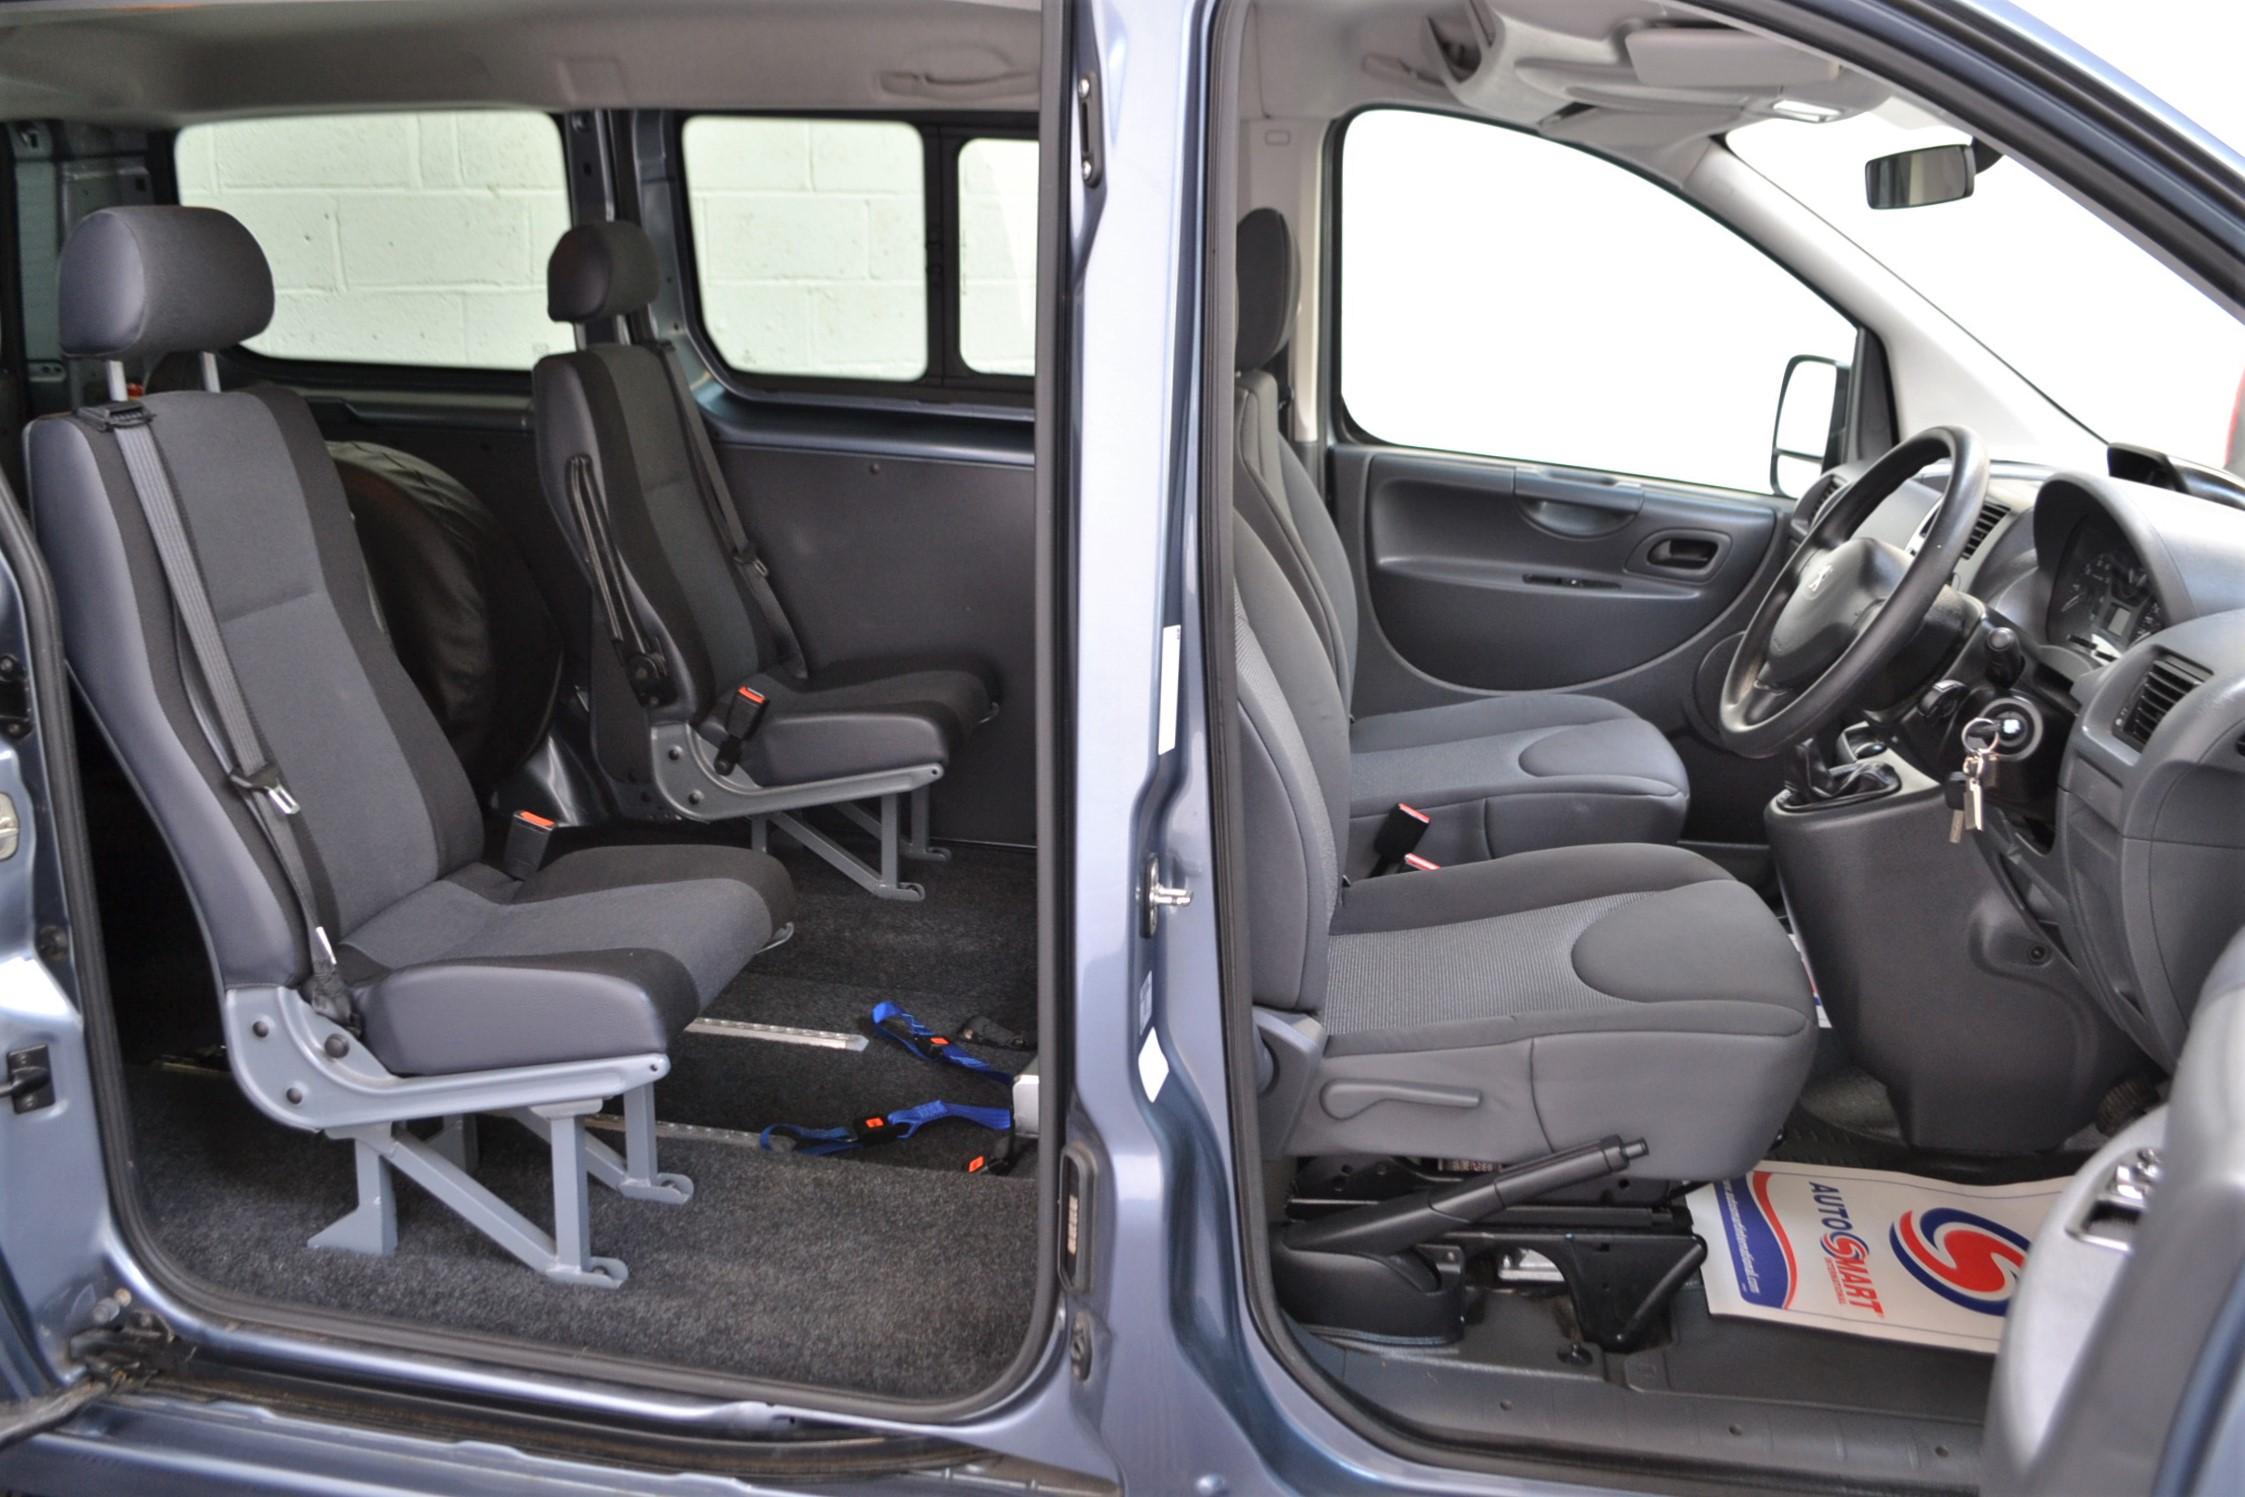 WAV Cars For Sale Bristol Wheelchair Accessible Vehicles Used For Sale Somerset Devon Dorset Bath Peugeot Expert YJ65 JDU 19